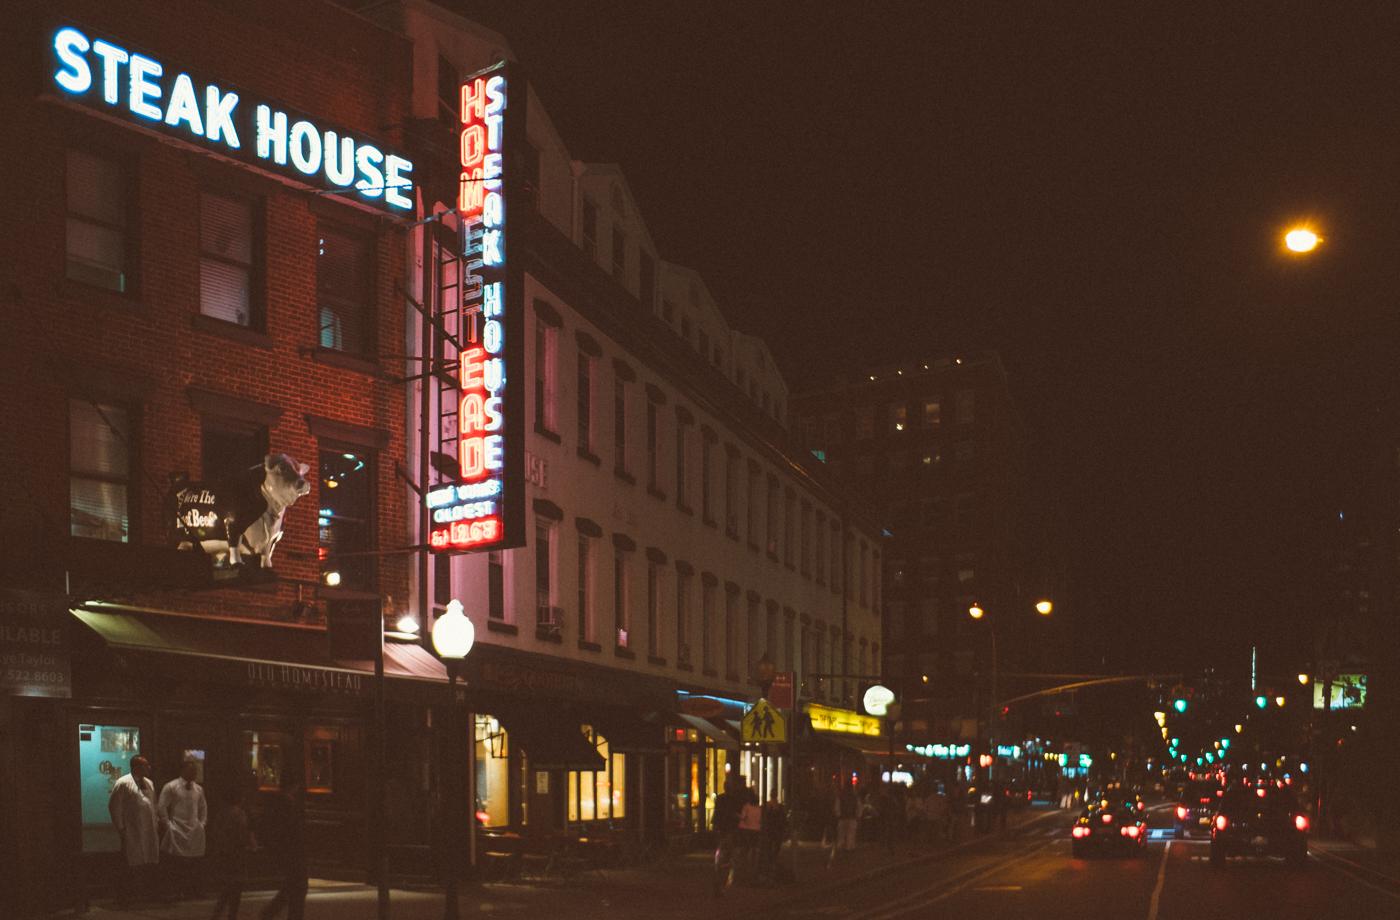 Steak House